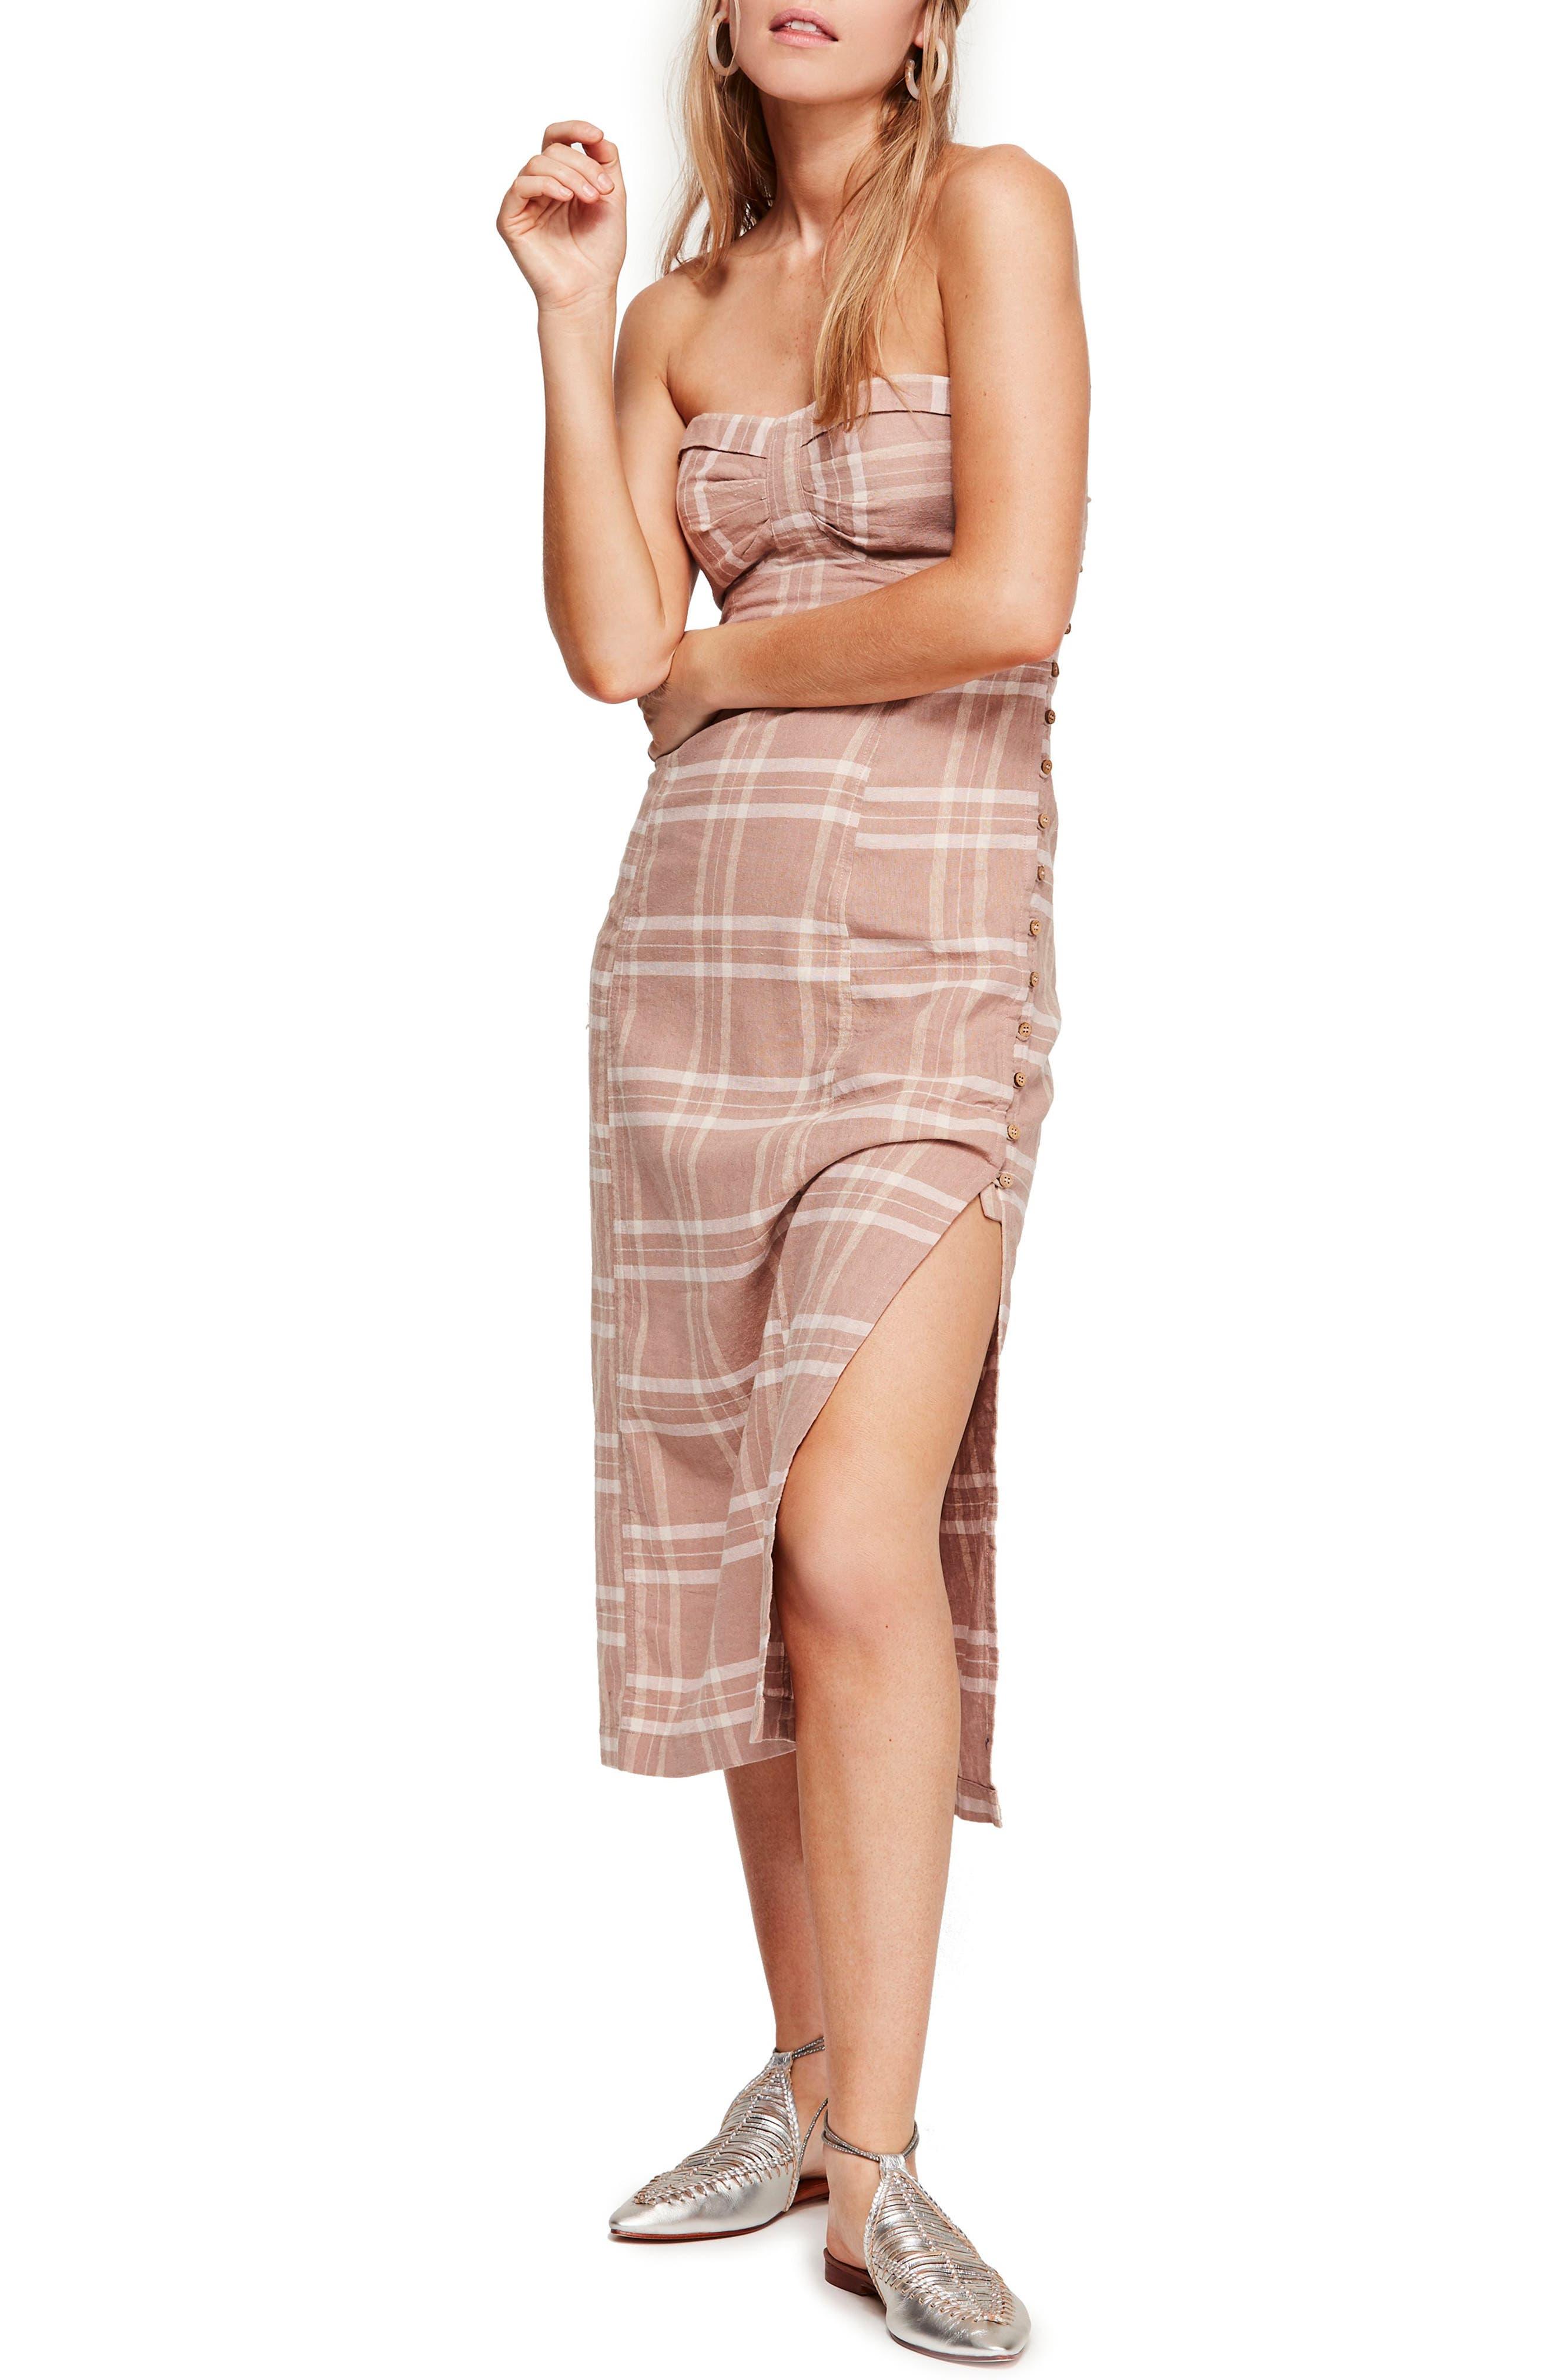 Free People Life Like This Strapless Midi Dress, Beige